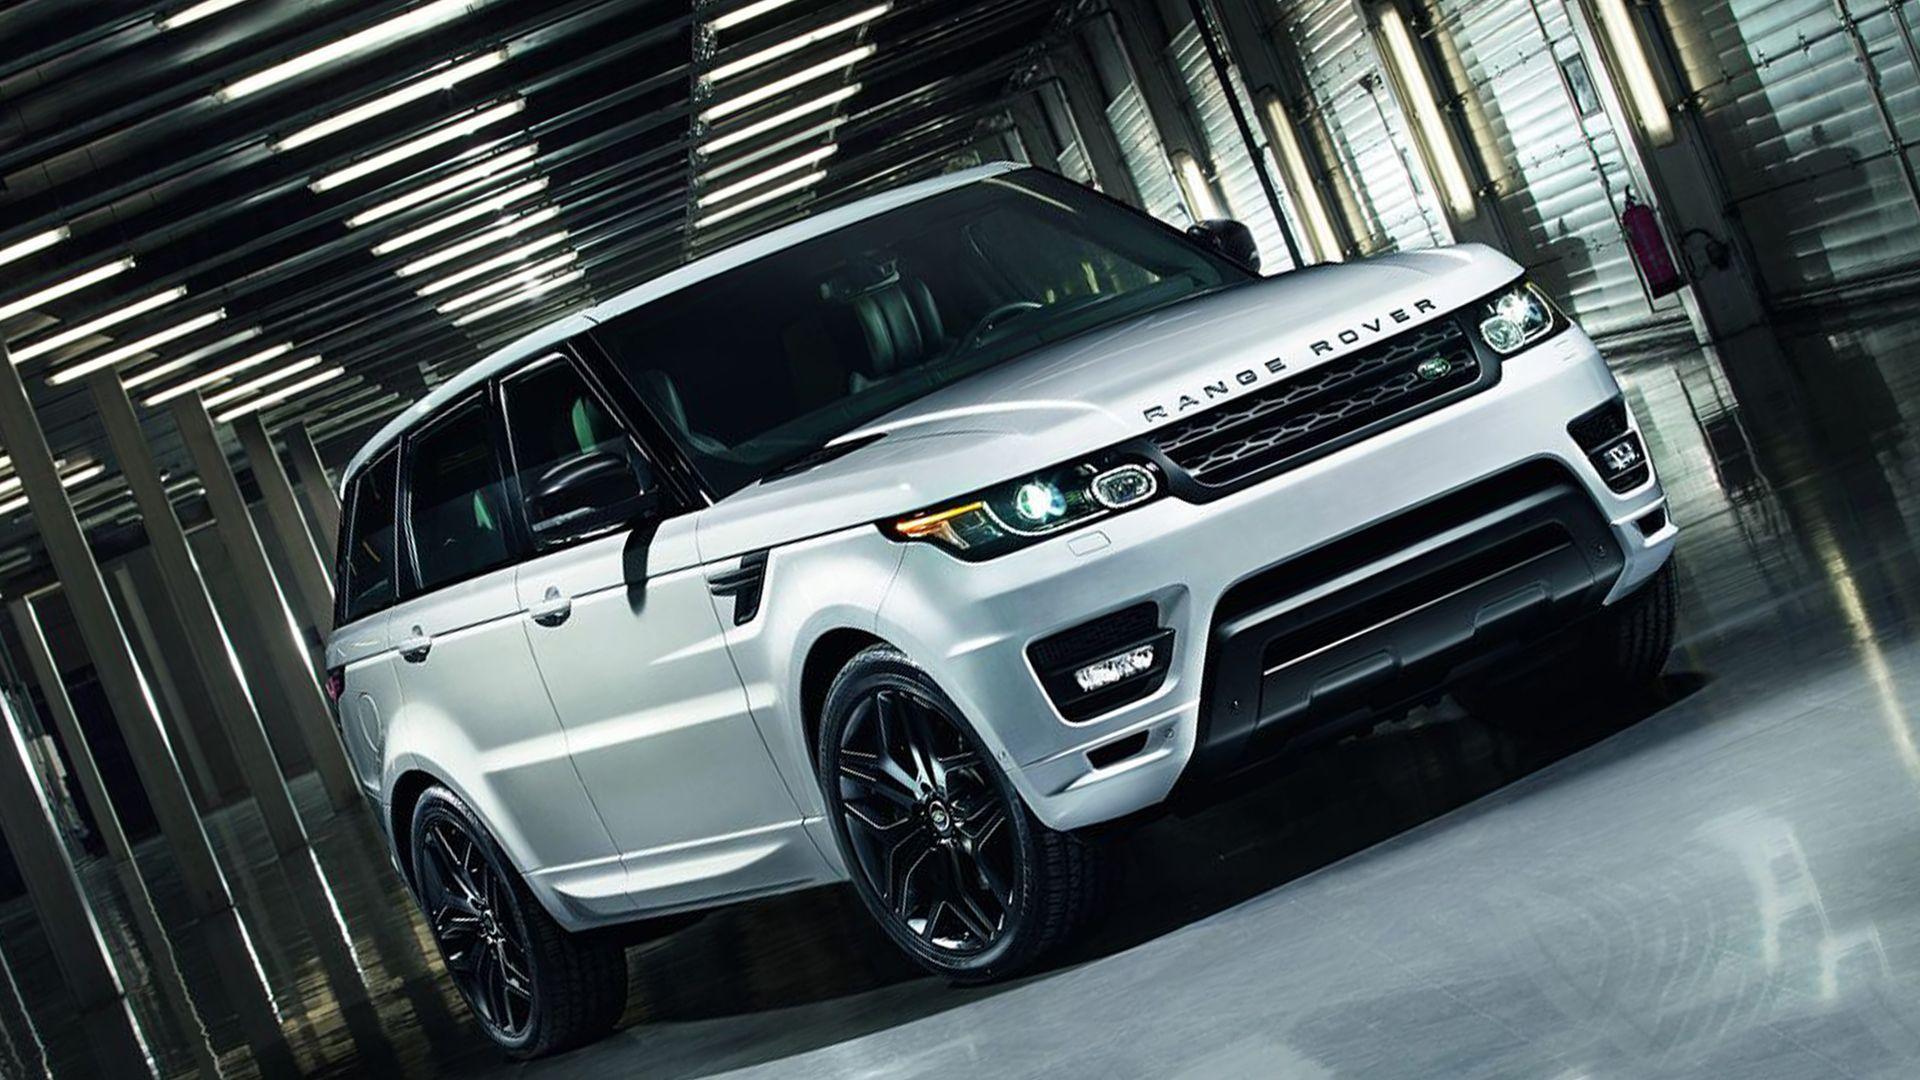 2019 Range Rover Sport Release Date